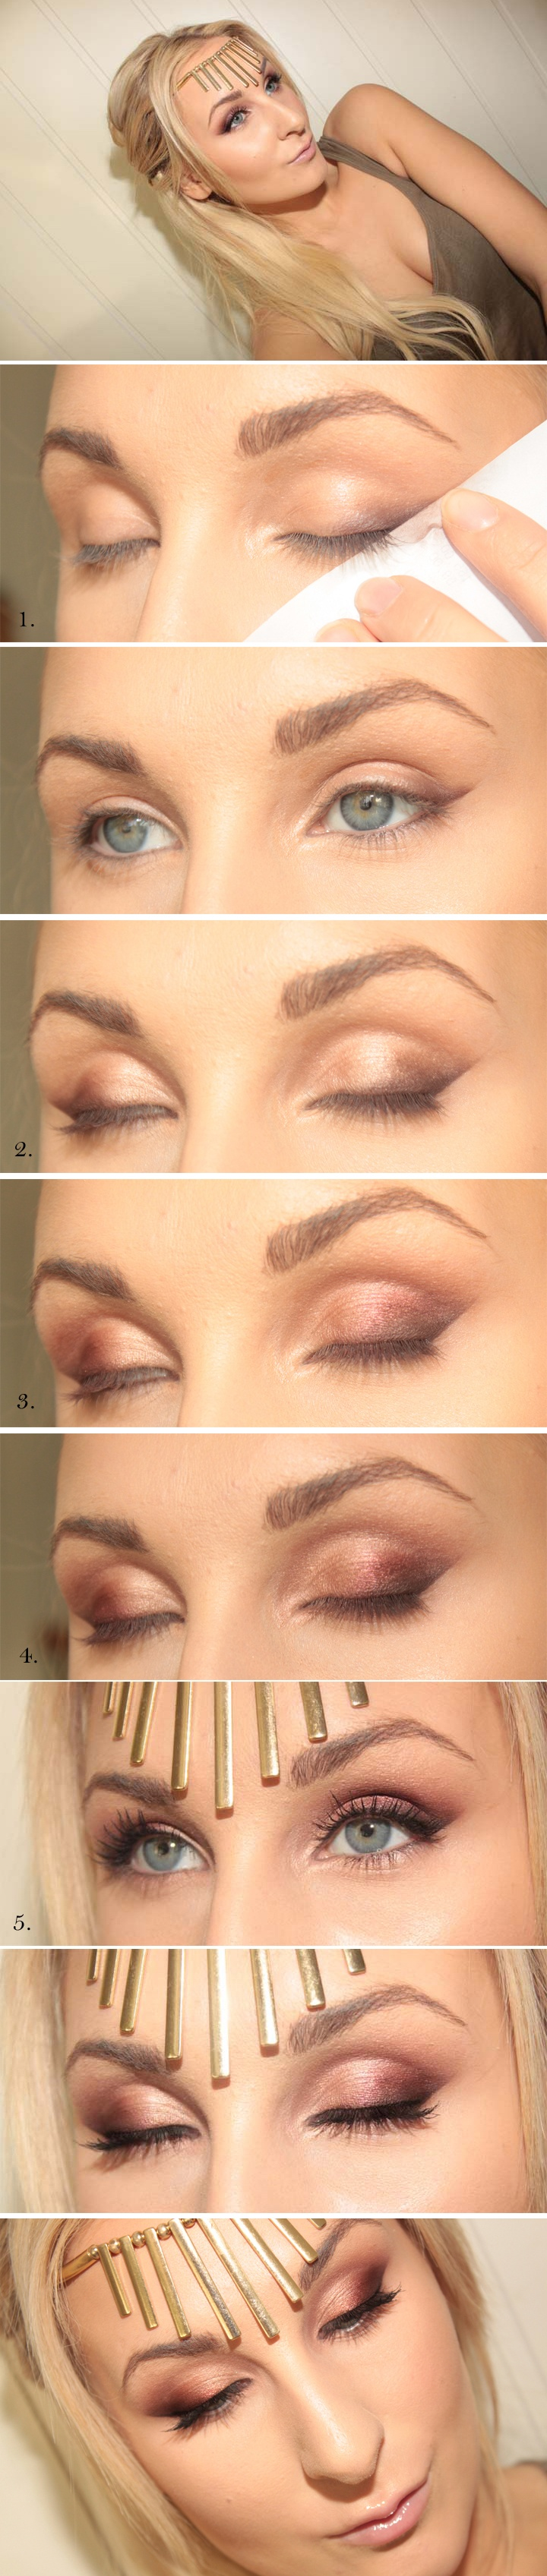 Tutorial – Arabian beauty http://blogg.veckorevyn.com/hiilen/2012/08/26/tutorial-arabiskinspirerad-makeup/